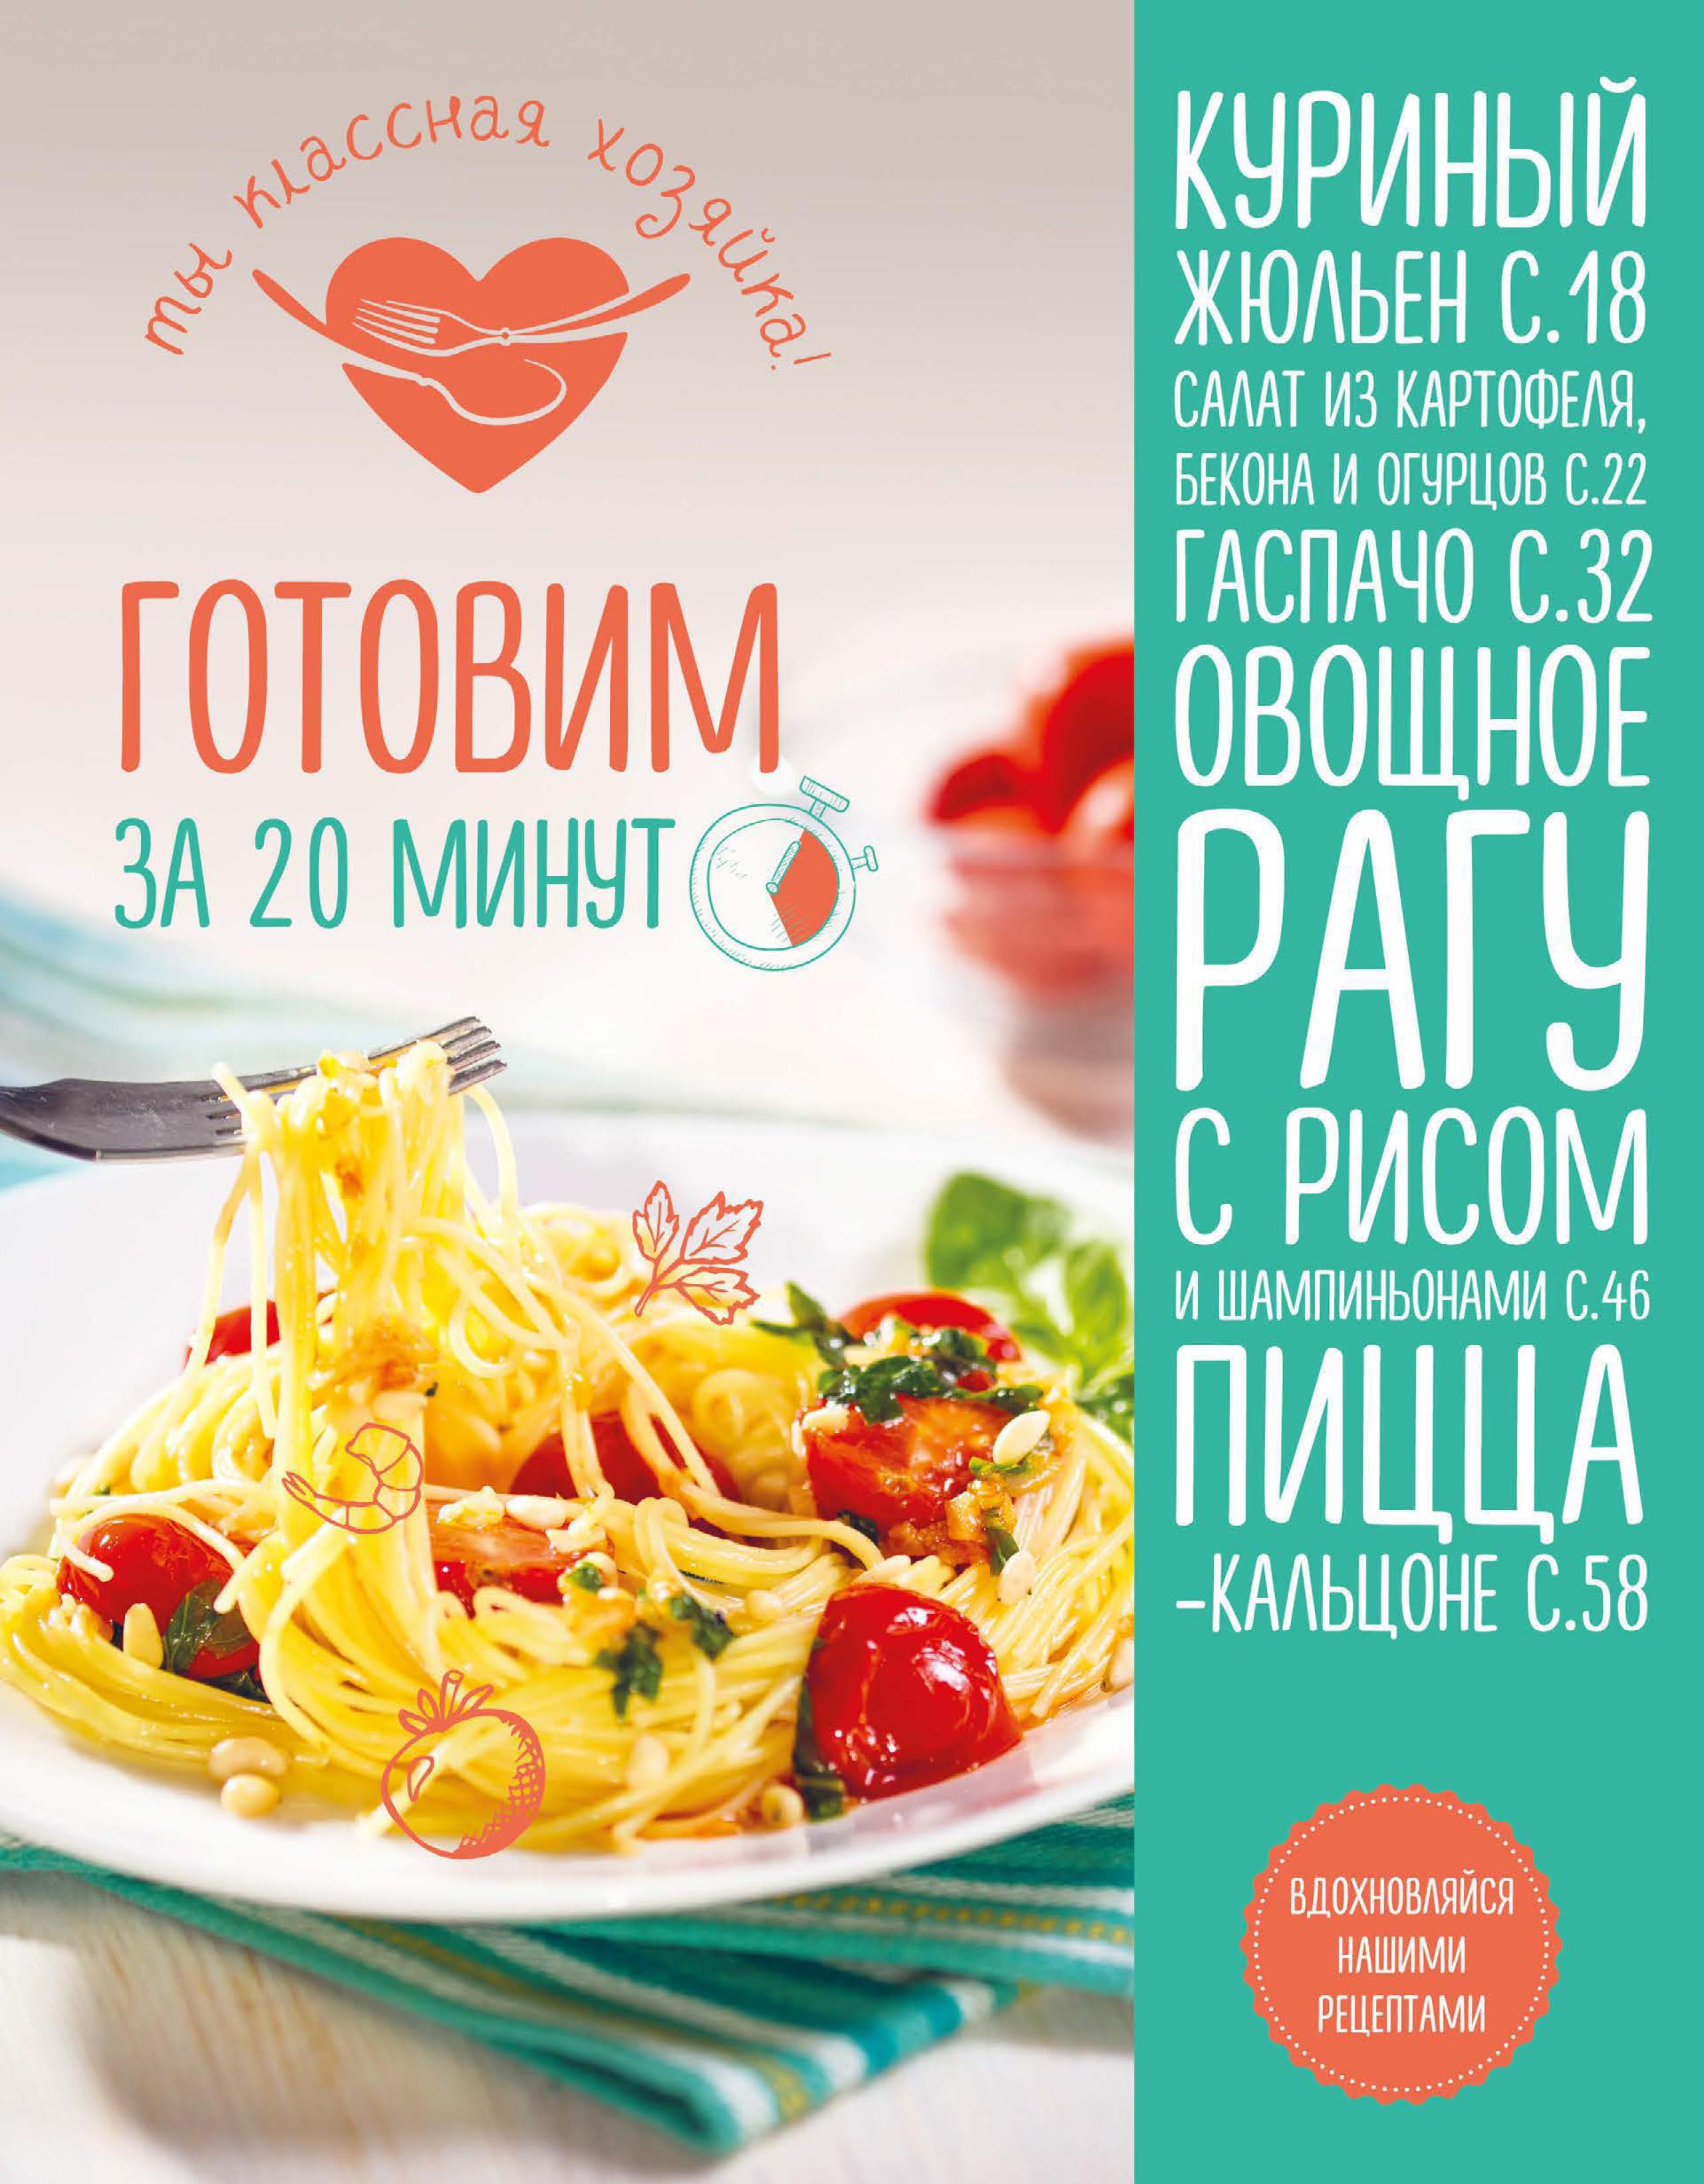 Татьяна Сотникова Готовим за 20 минут татьяна сотникова готовим праздник всей семьей